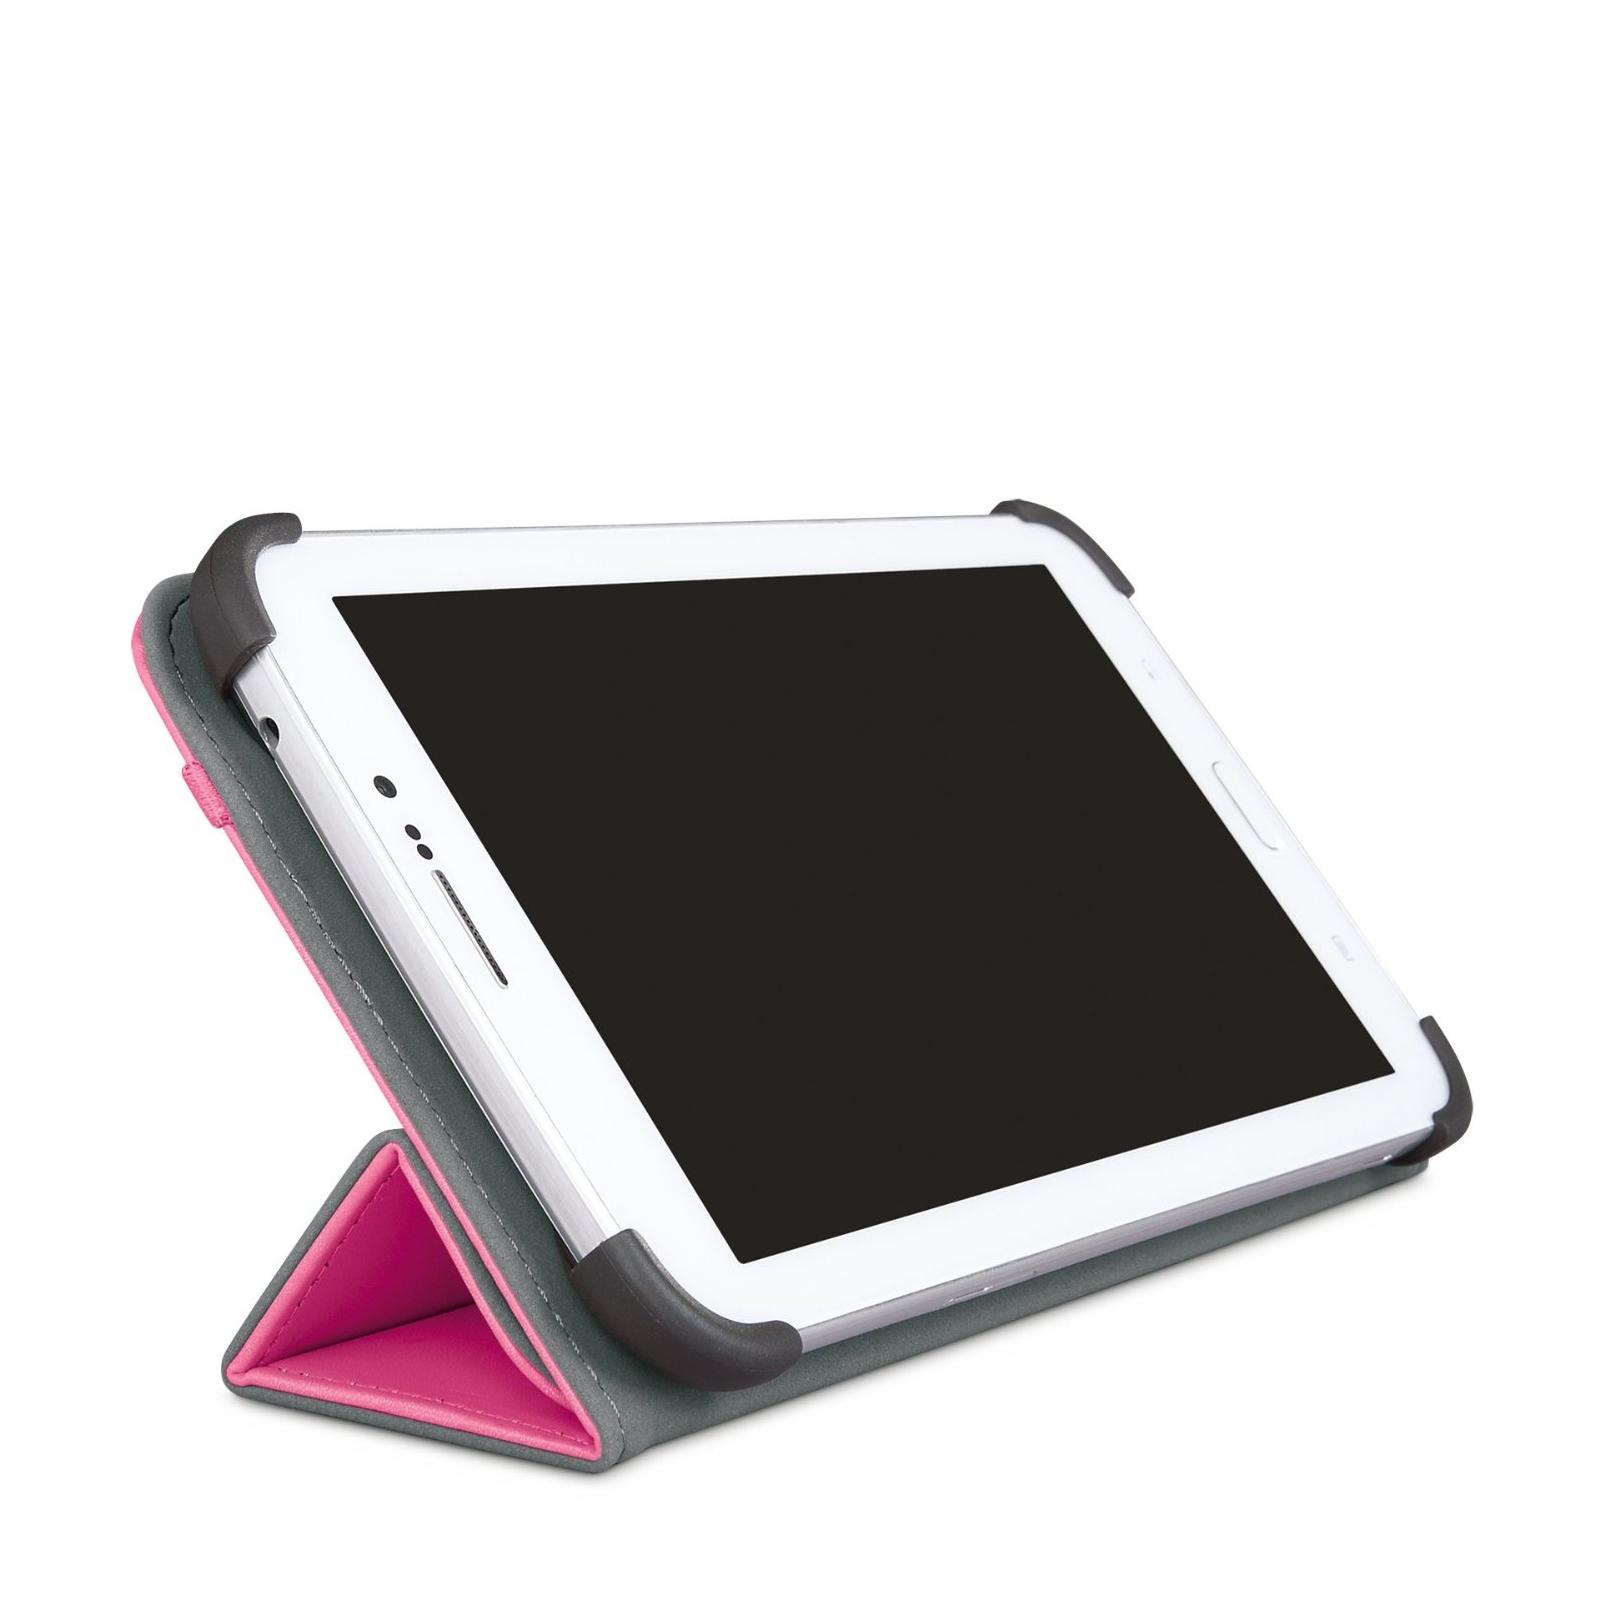 Чехол для планшета Belkin 7 GalaxyTab3 Tri-Fold Cover Stand/pink (F7P120vfC02) изображение 3